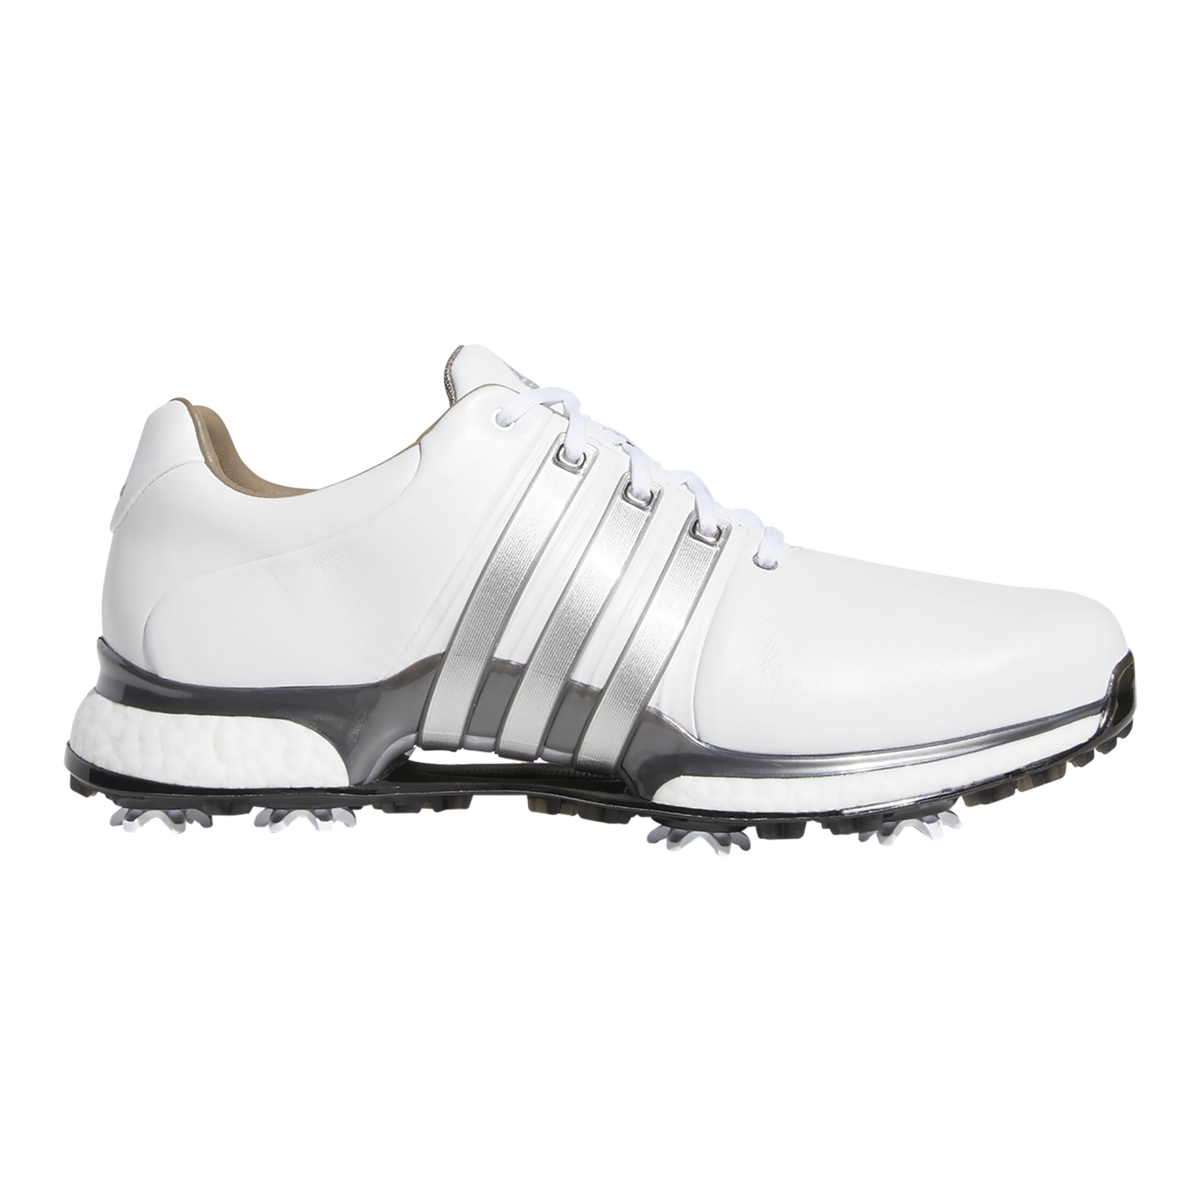 21faa41ebce adidas TOUR360 XT Men s Golf Shoe - White Silver